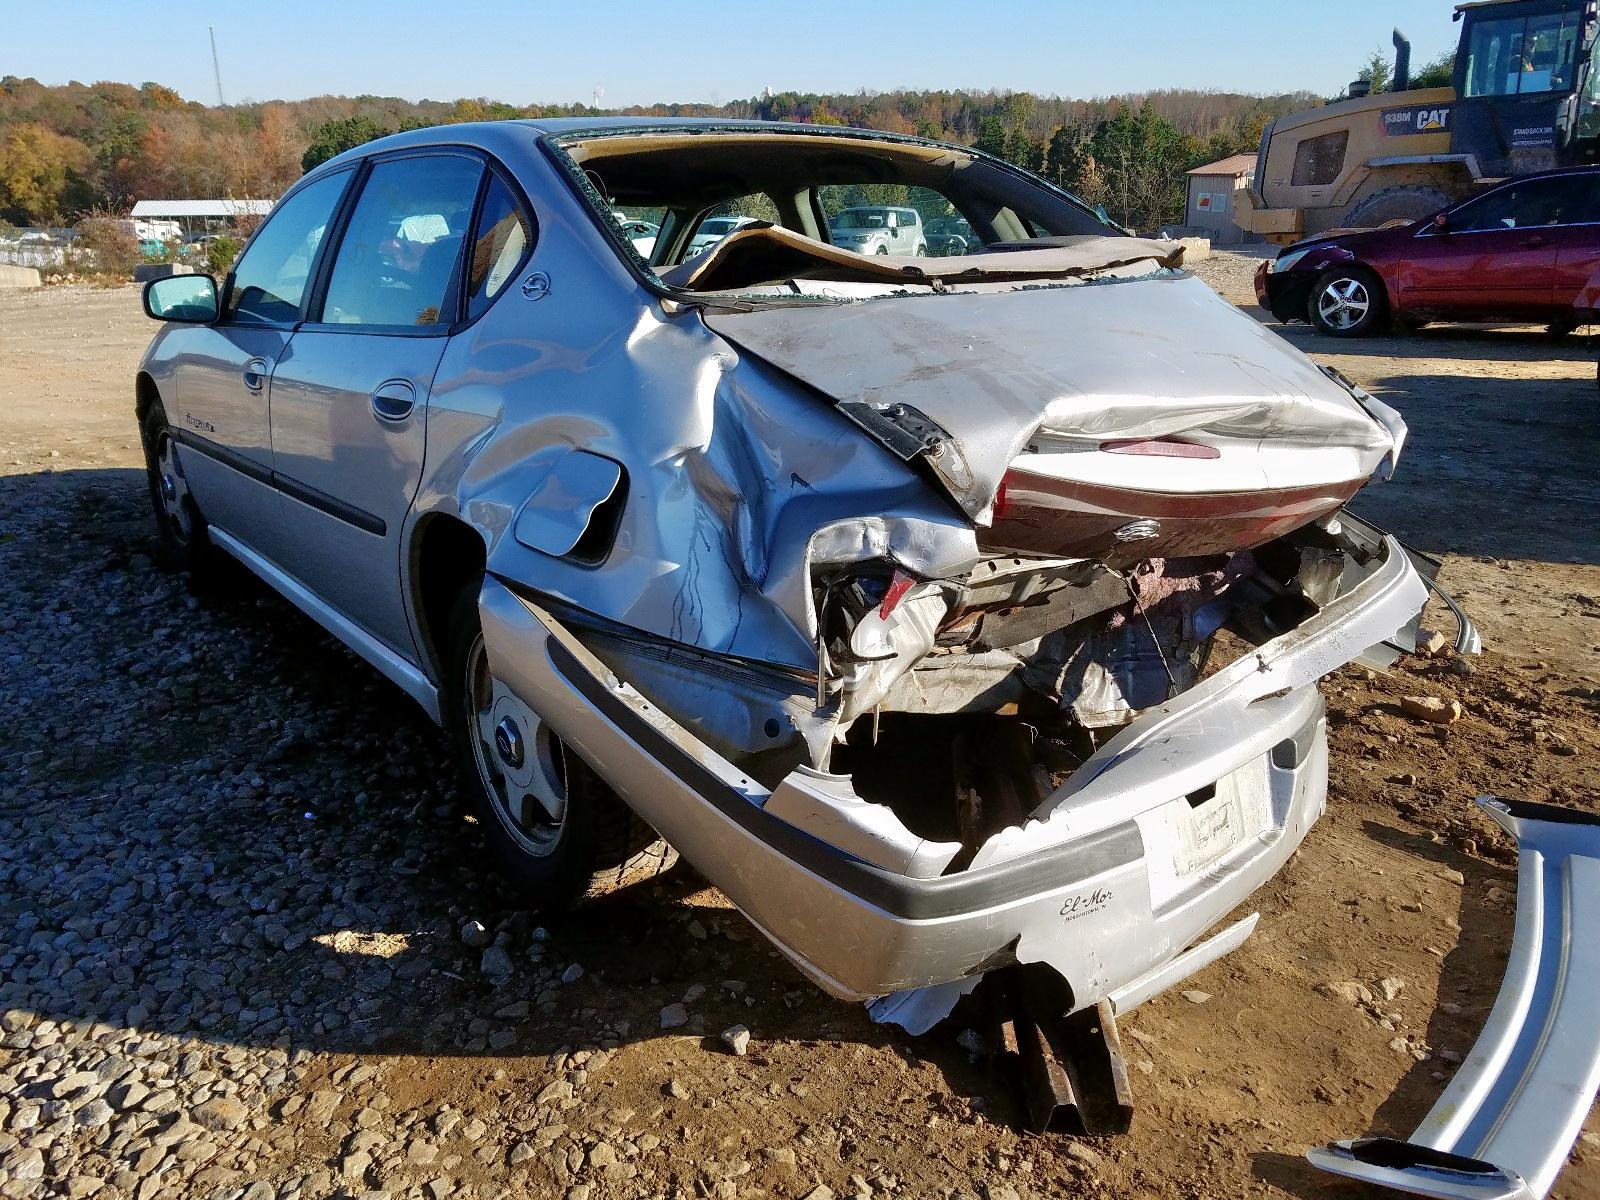 2G1WH55K5Y9130344 - 2000 Chevrolet Impala Ls 3.8L [Angle] View